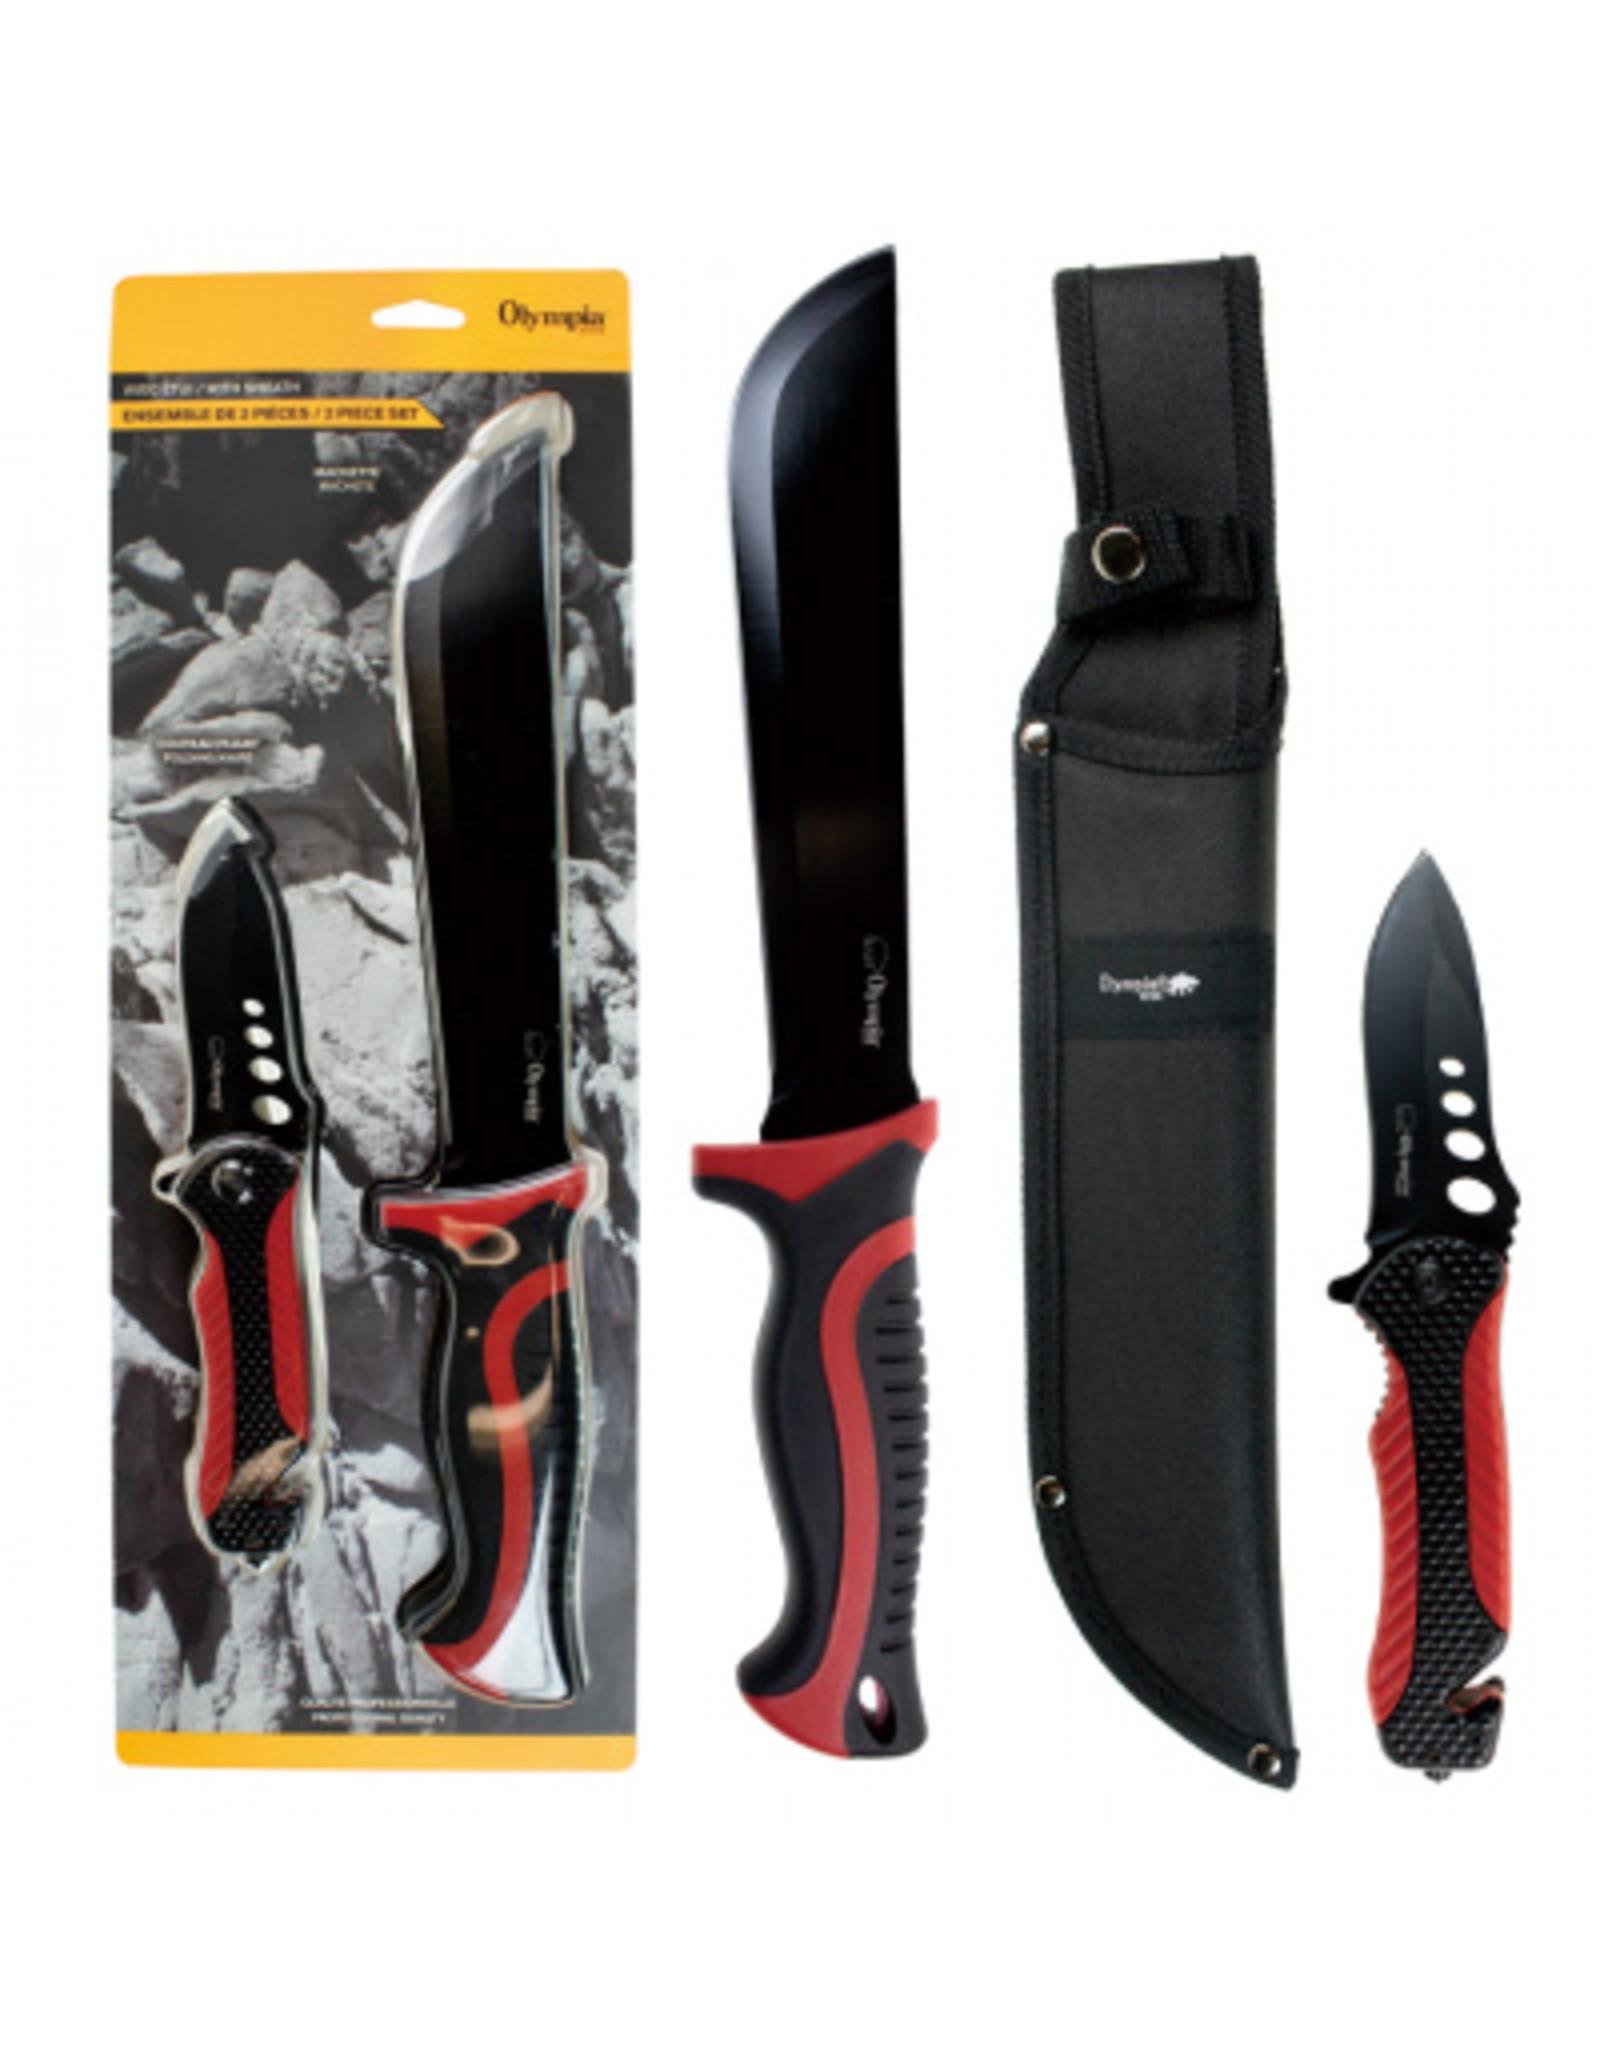 CIRCLE IMPORTS OLYMPIC 2PC KNIFE SET RED/BK